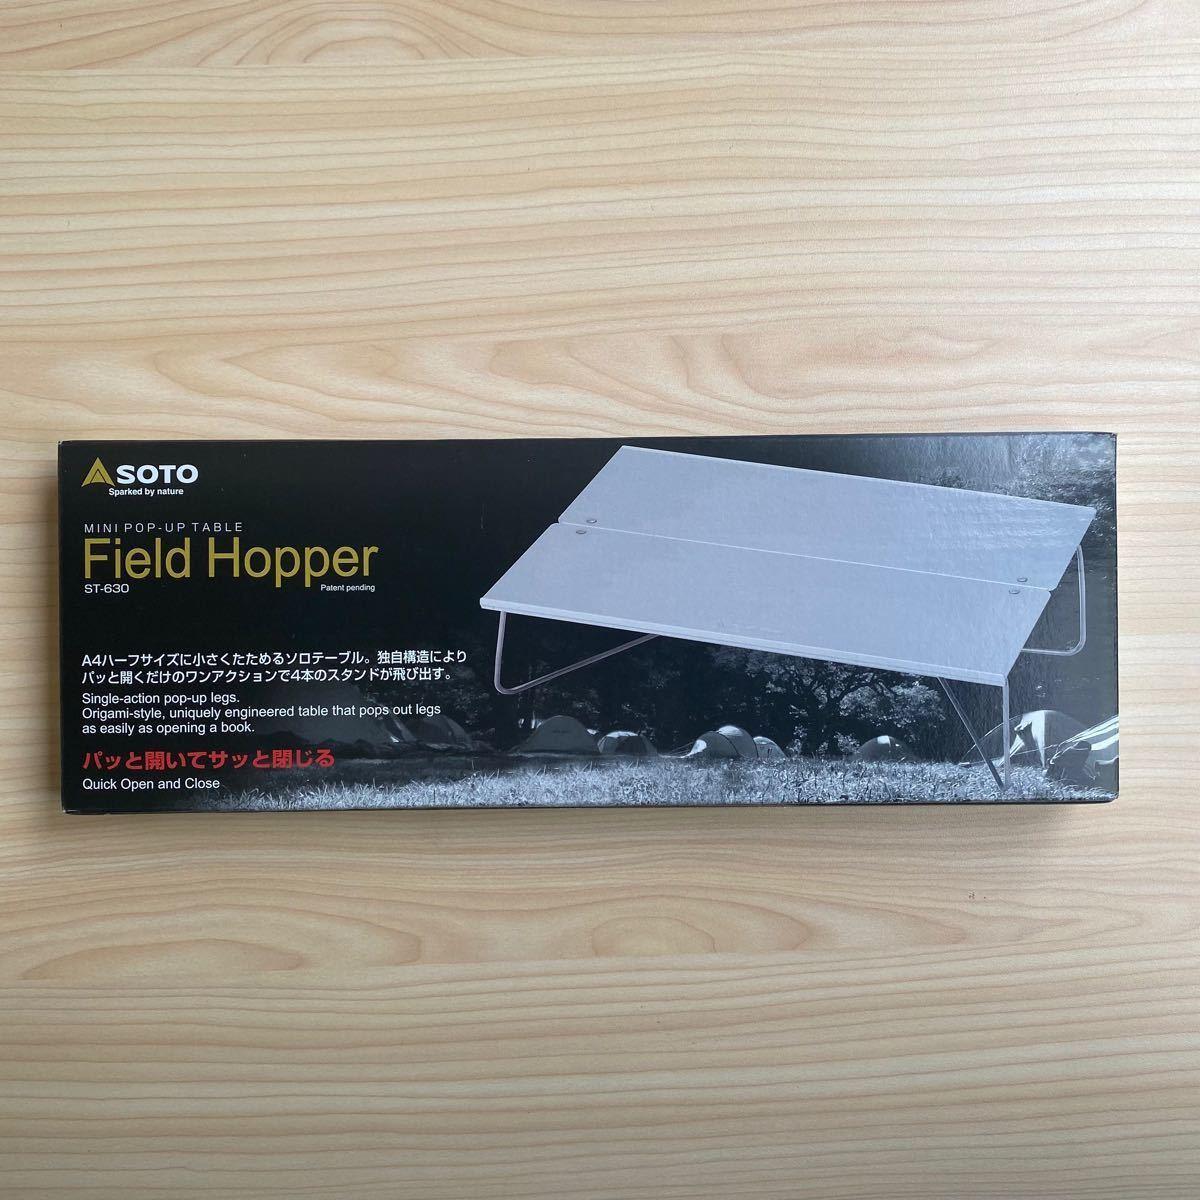 SOTO ポップアップテーブル フィールドホッパー ST-630 新富士バーナー コンパクト 簡単設営 ワンアクション ソト